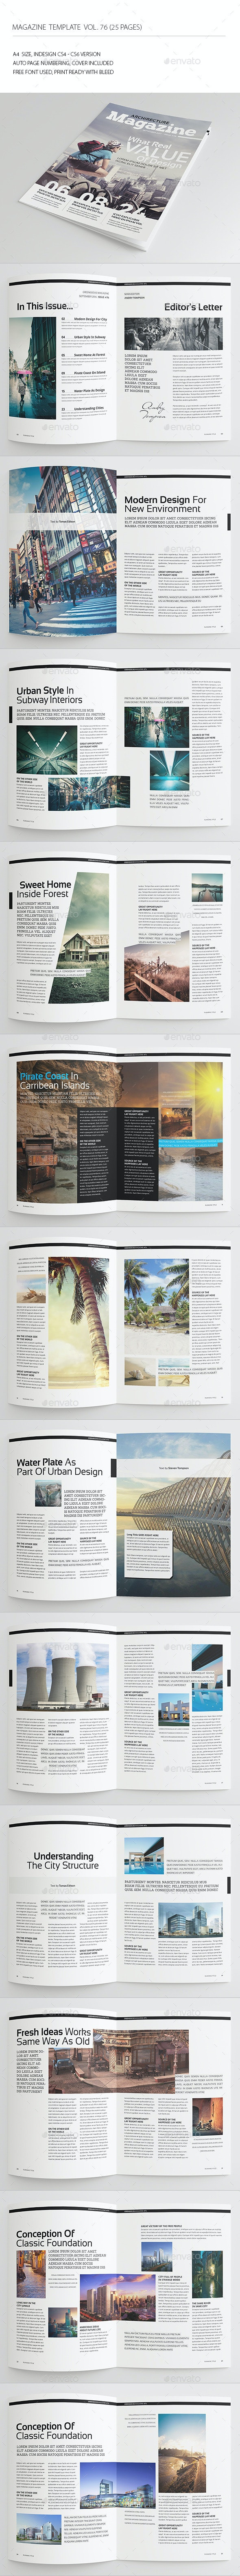 25 Pages Architect Magazine Vol76 - Magazines Print Templates